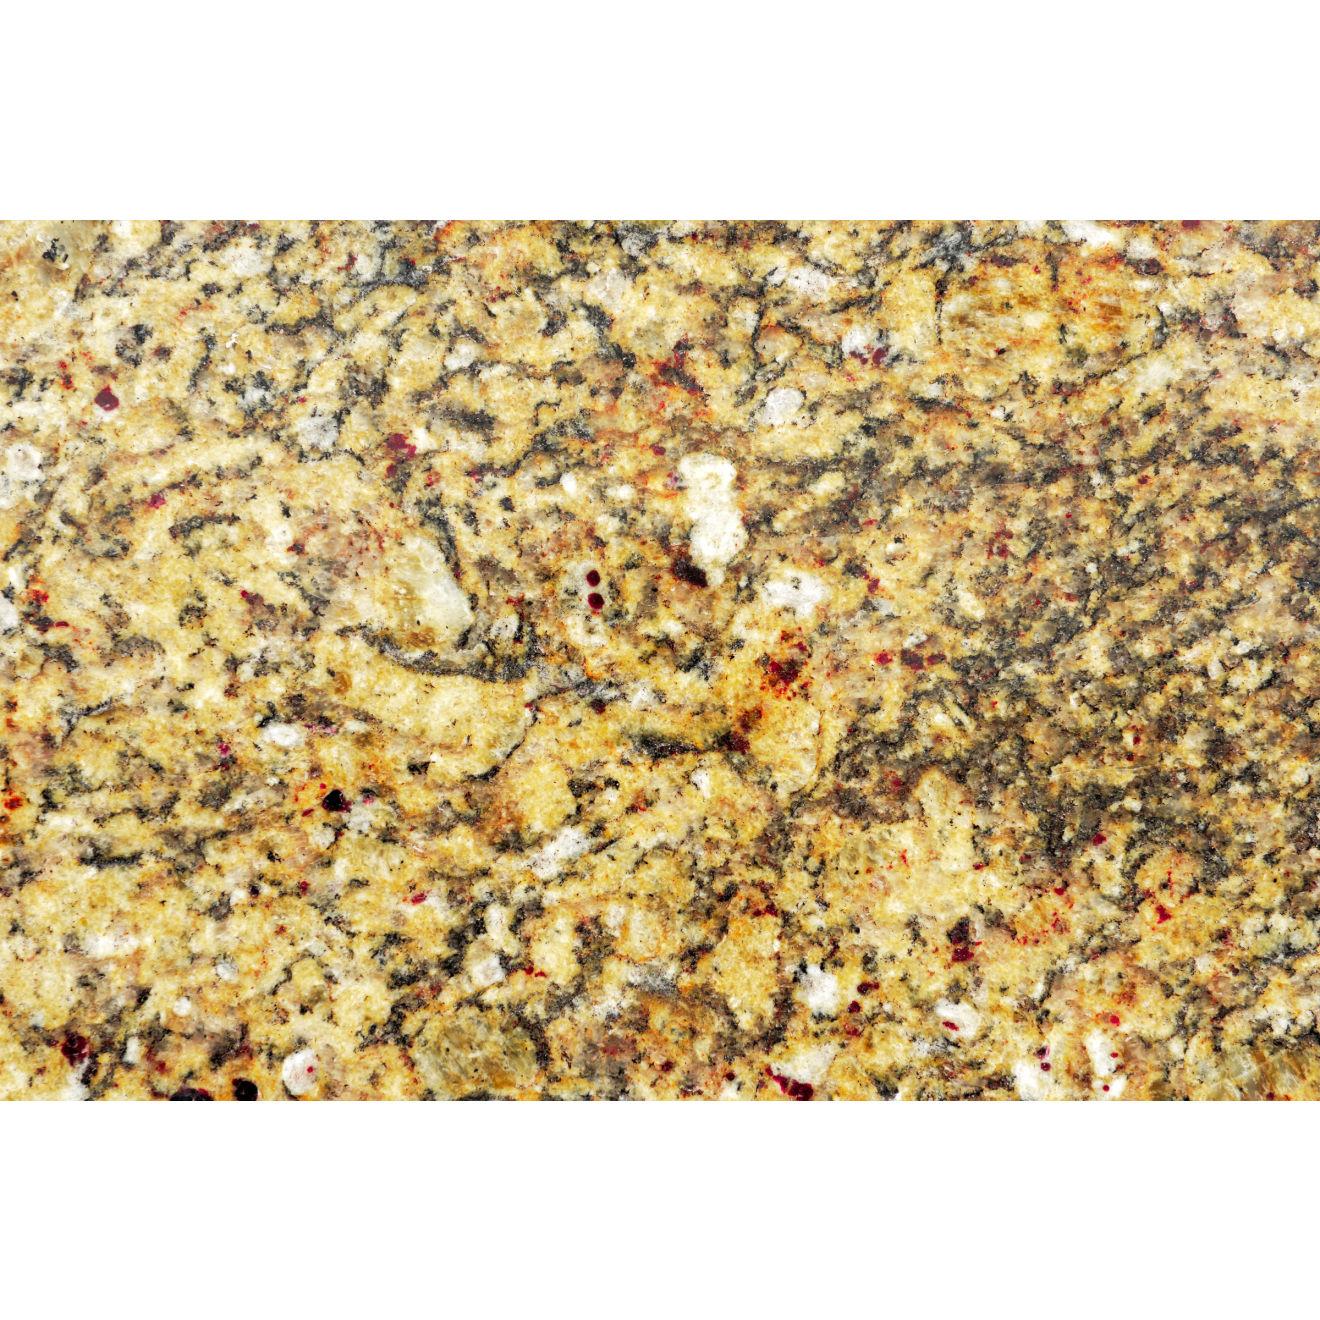 New Venetian Gold Granite In 2 Cm Bedrosians Tile Amp Stone